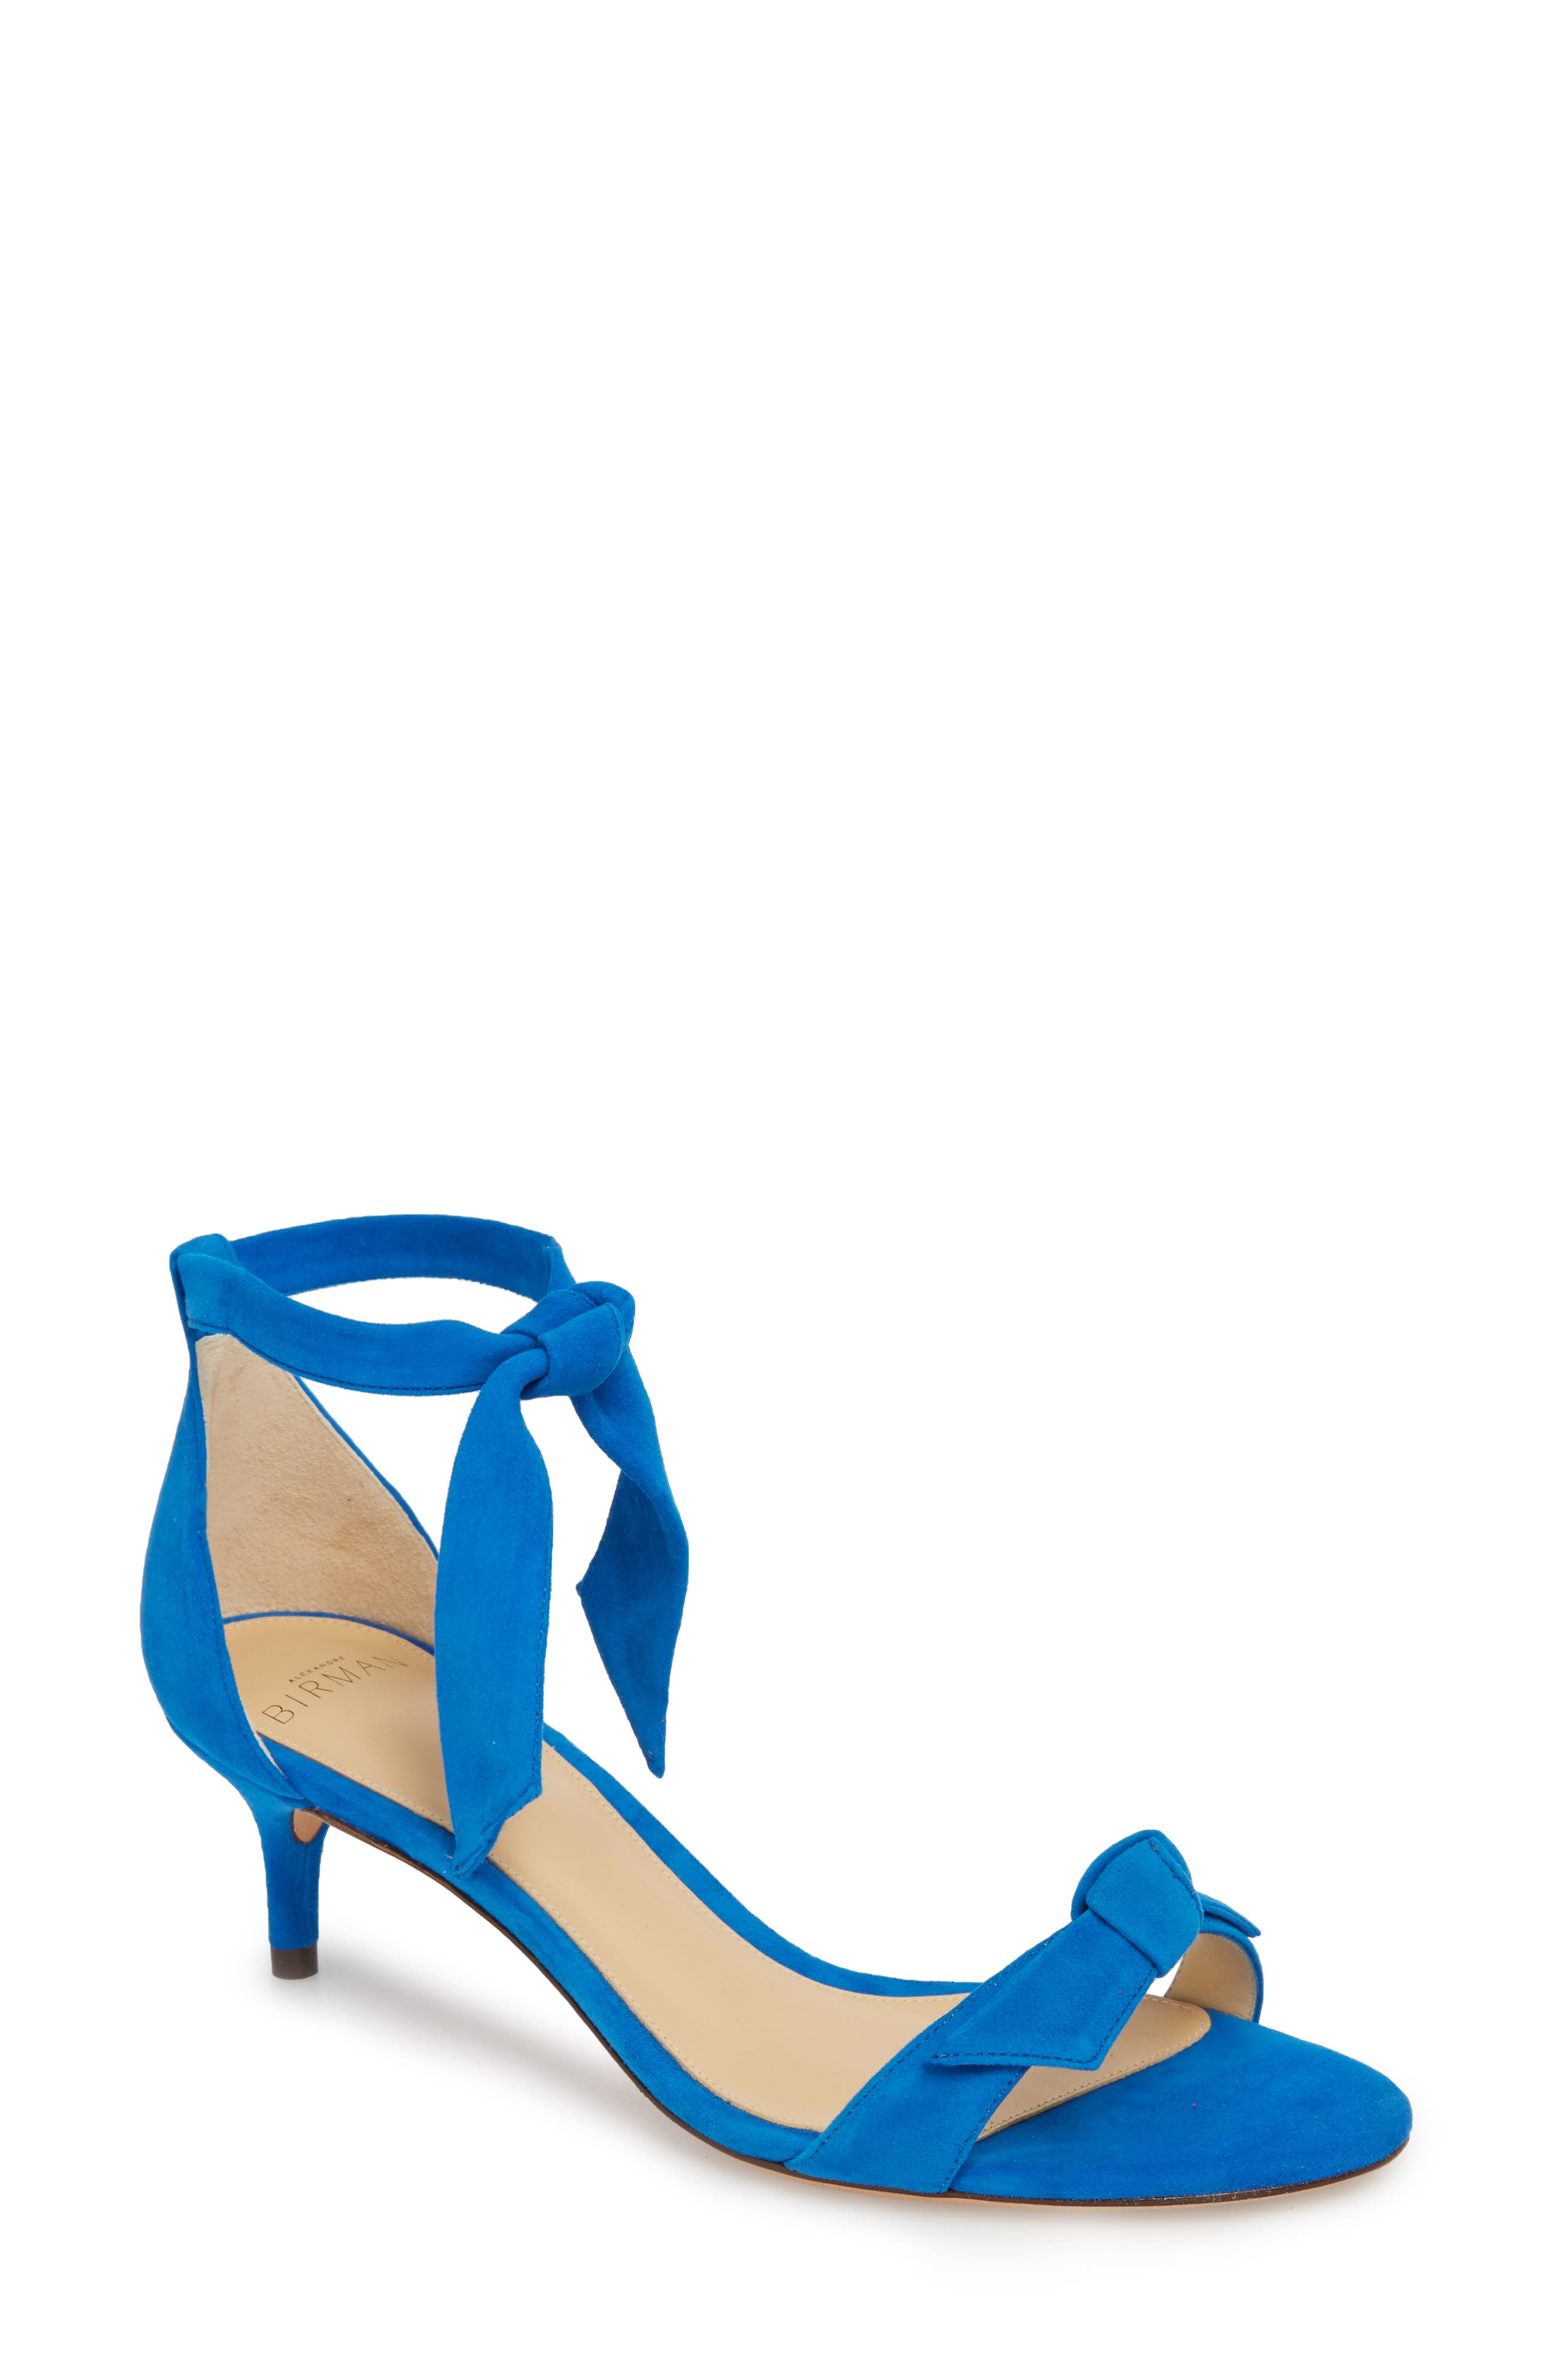 Alternate Image 1 Selected - Alexandre Birman Clarita Knotted Sandal (Women)